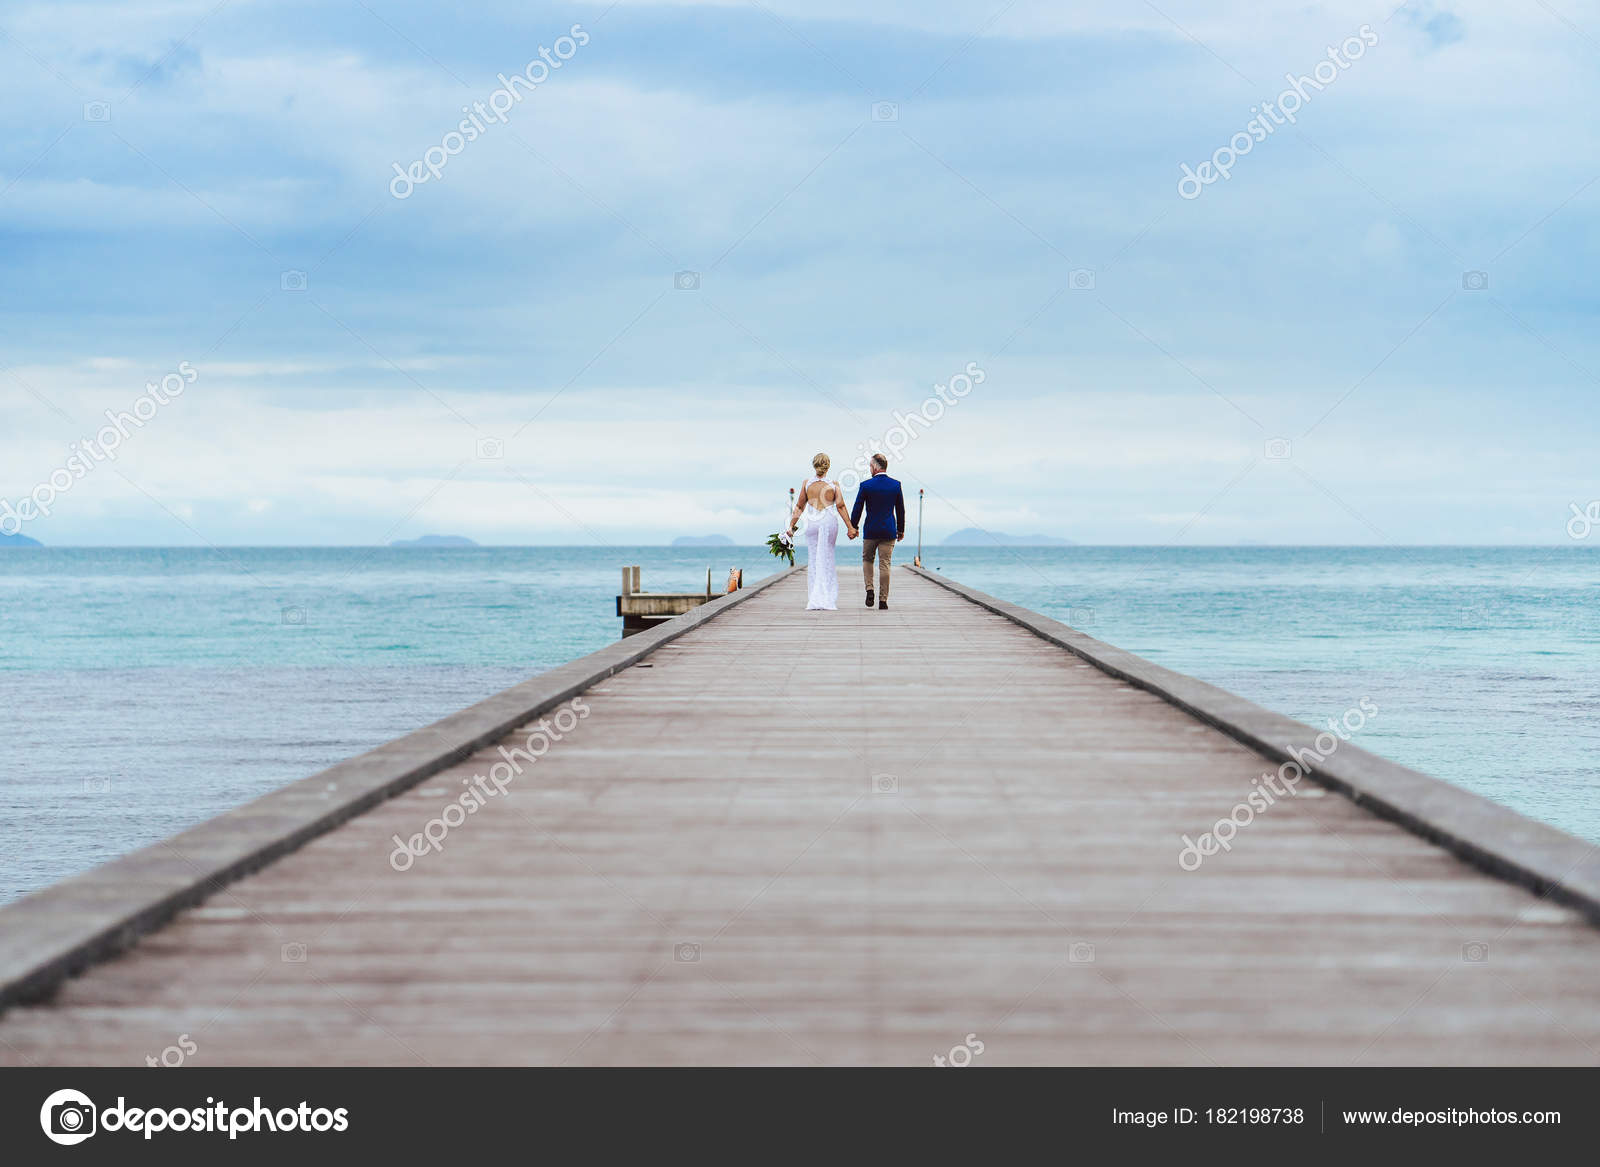 3792b0a02b177f Bride Groom Walking Wooden Pier Ocean Light Cloud Sunset — Stock ...